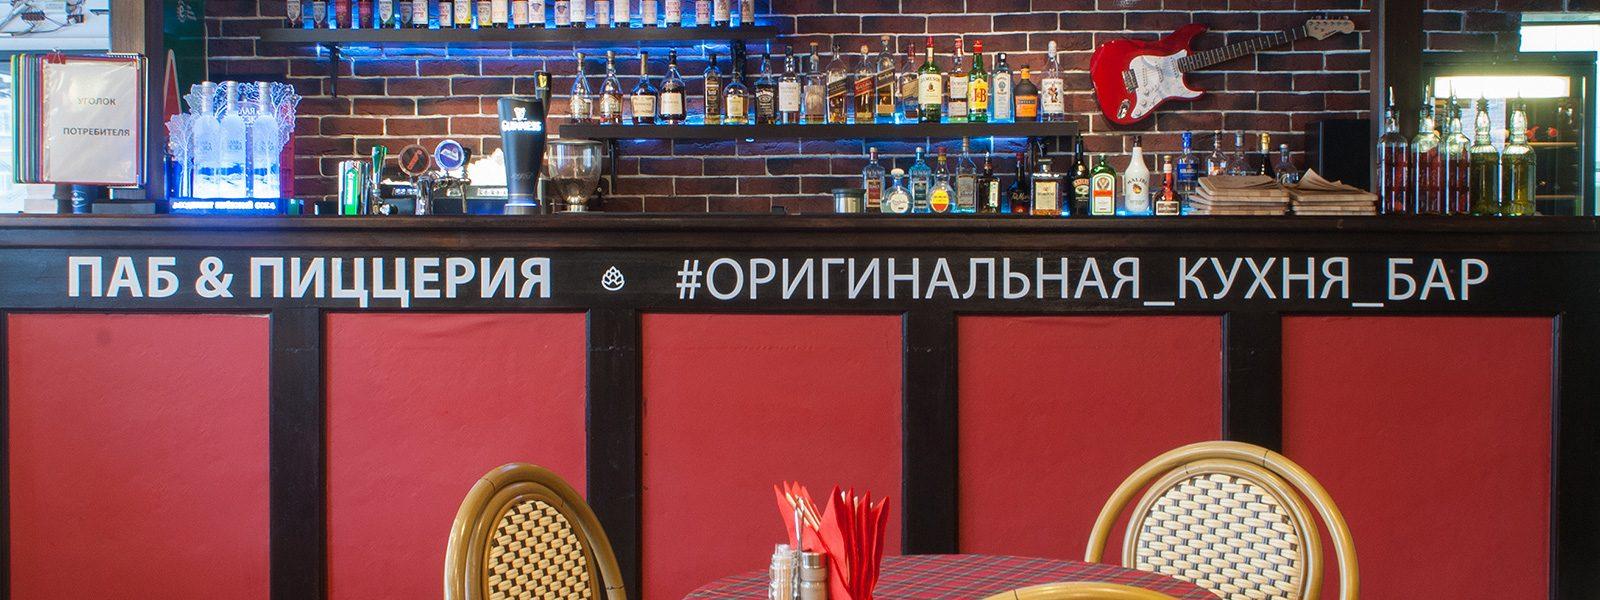 ПАБ-&-ПИЦЦЕРИЯ-#оригинальная_кухня_бар-вид-на-бар